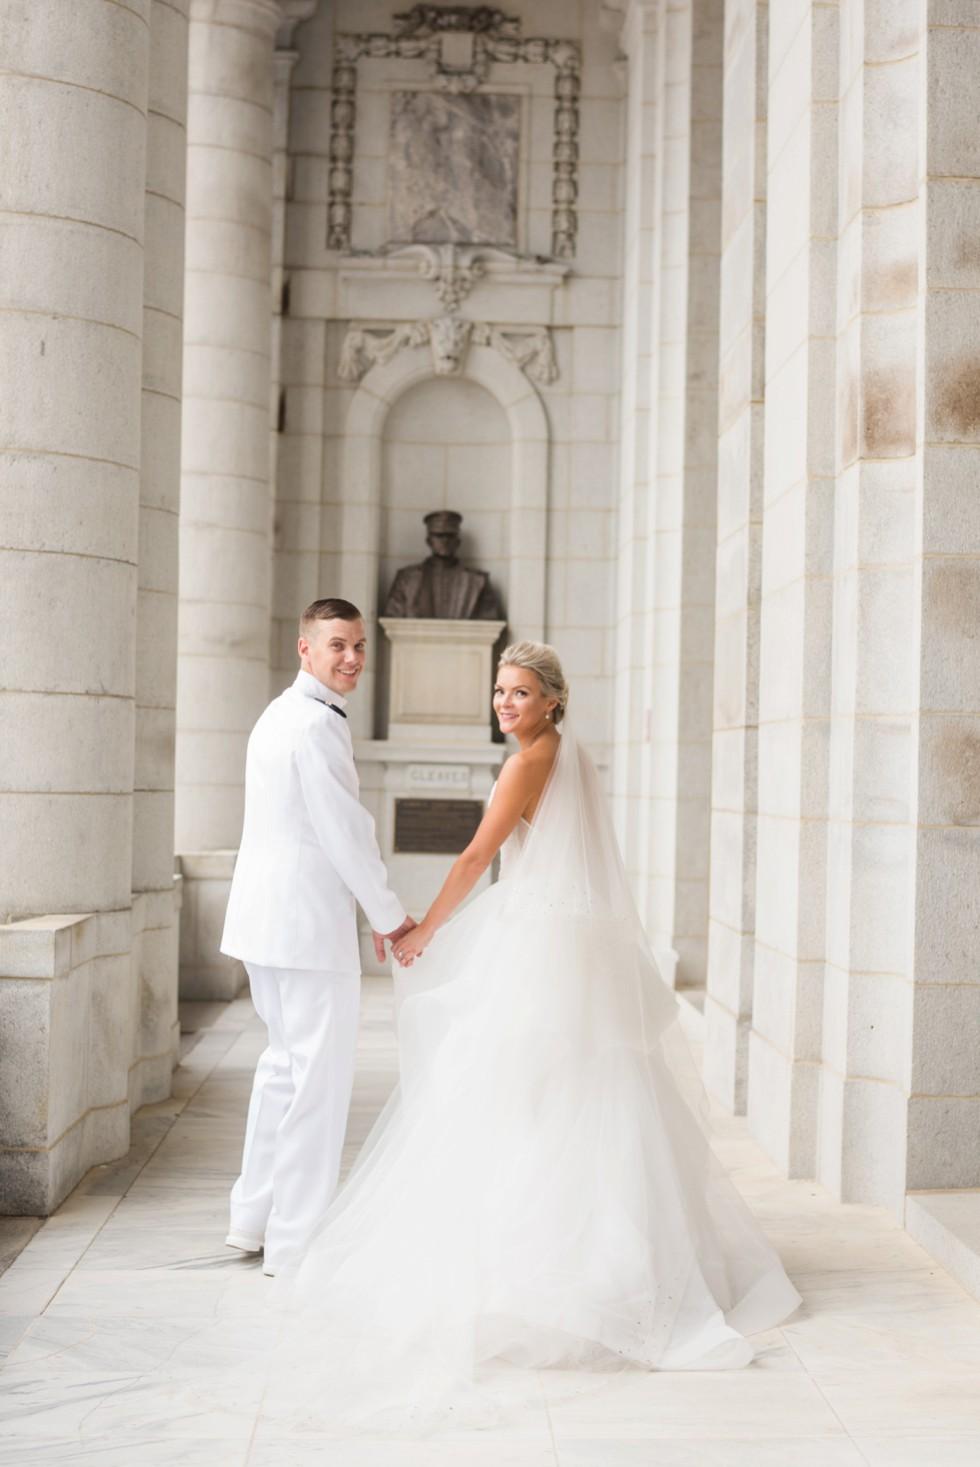 USNA Annapolis wedding photos at Memorial Hall